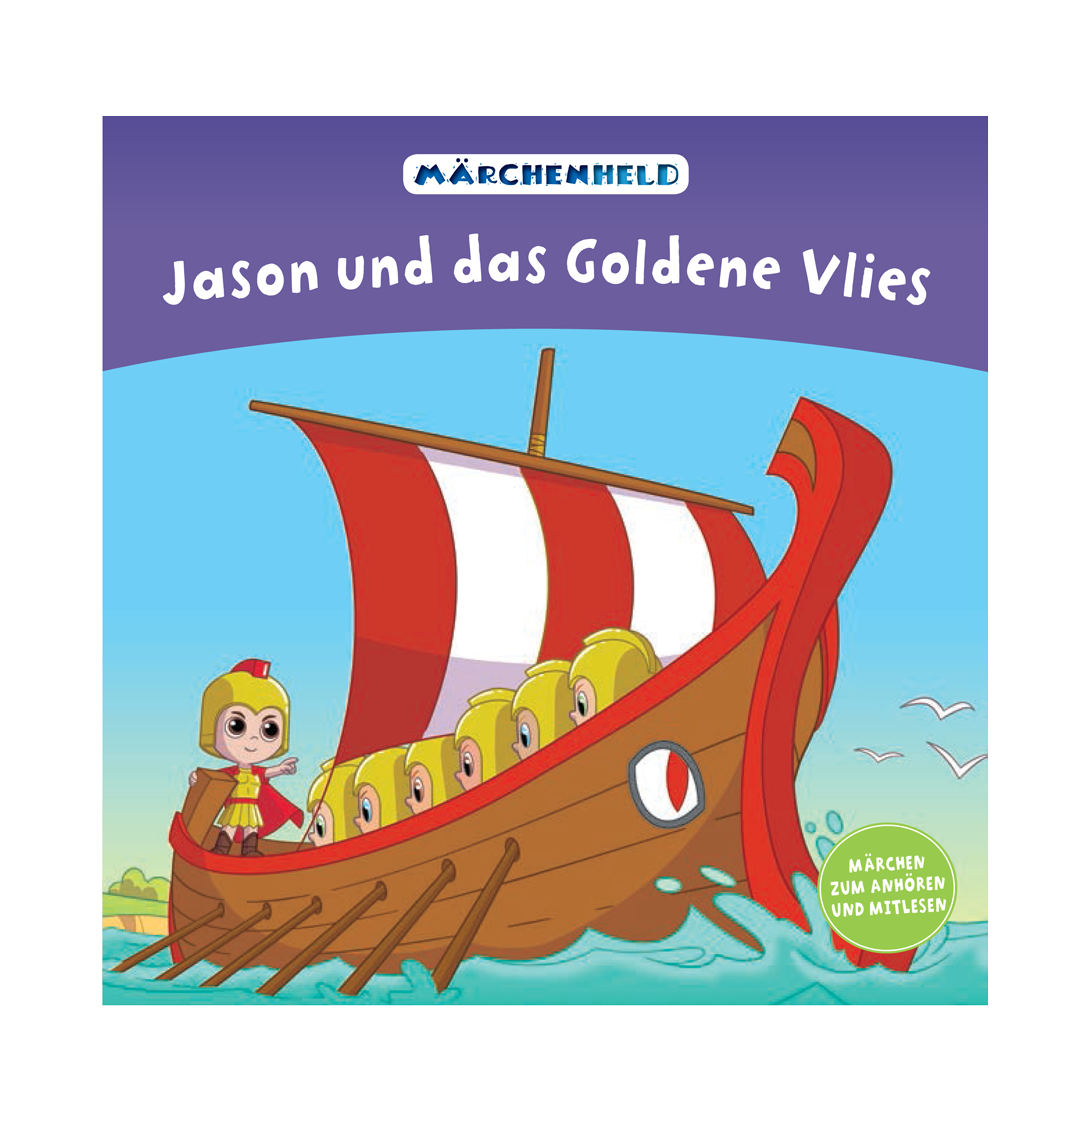 Märchenheld – Ausgabe 63